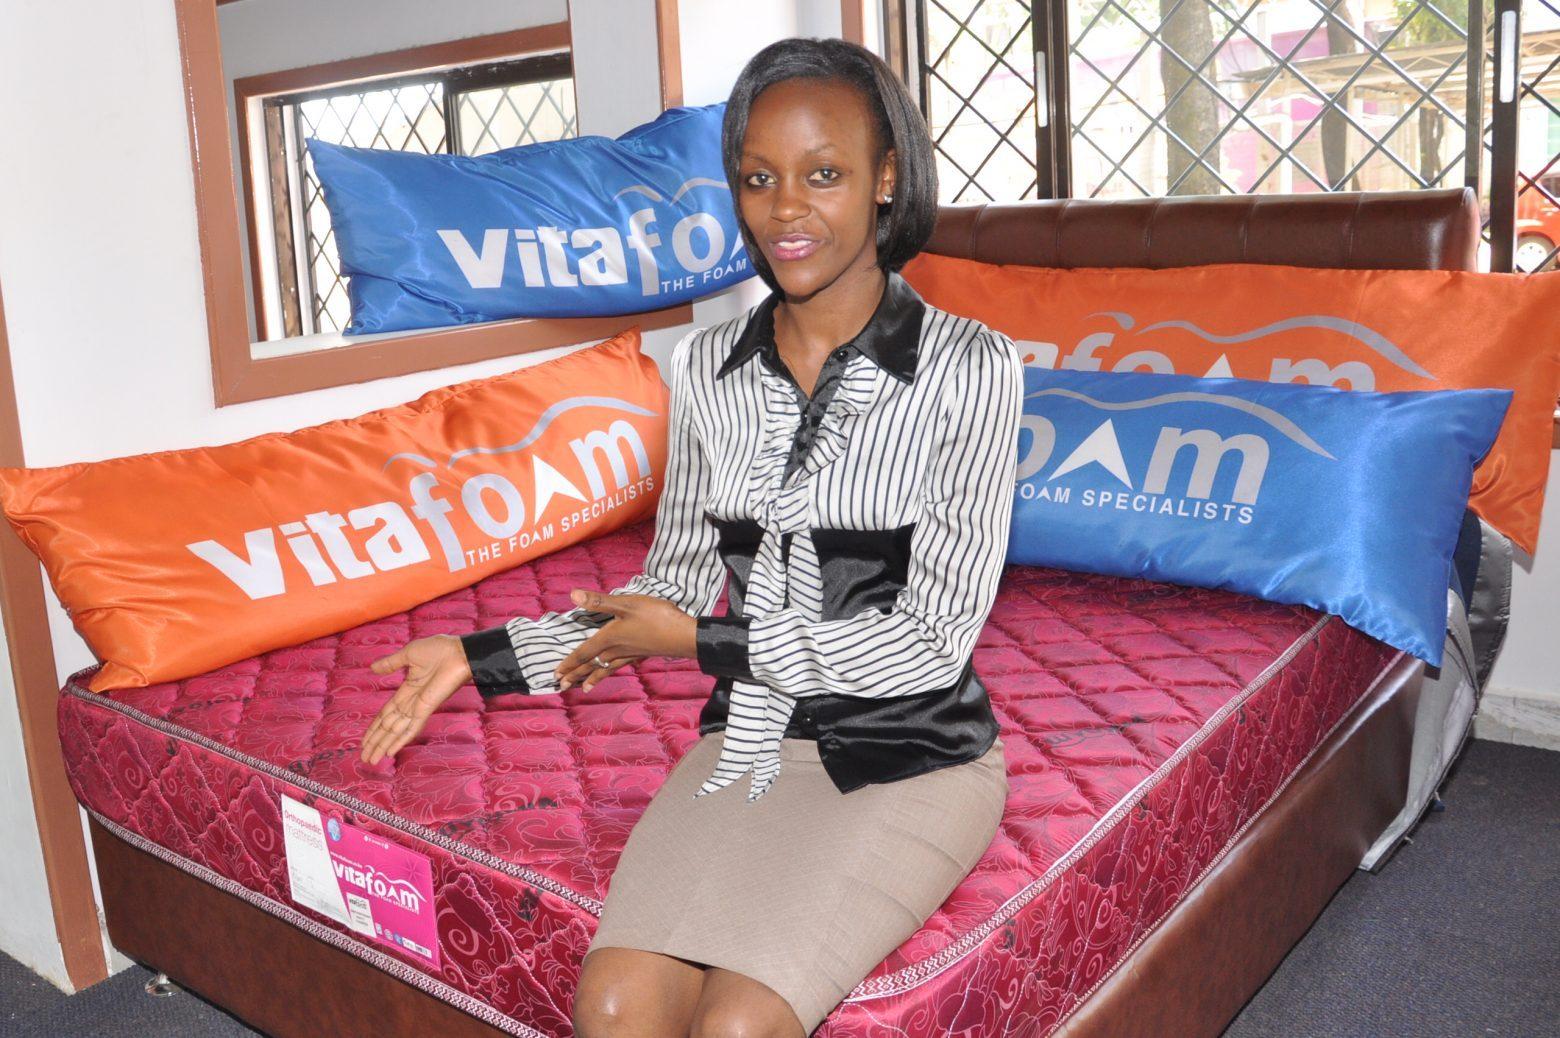 Vitafoam adds comfort brand to its range of mattresses